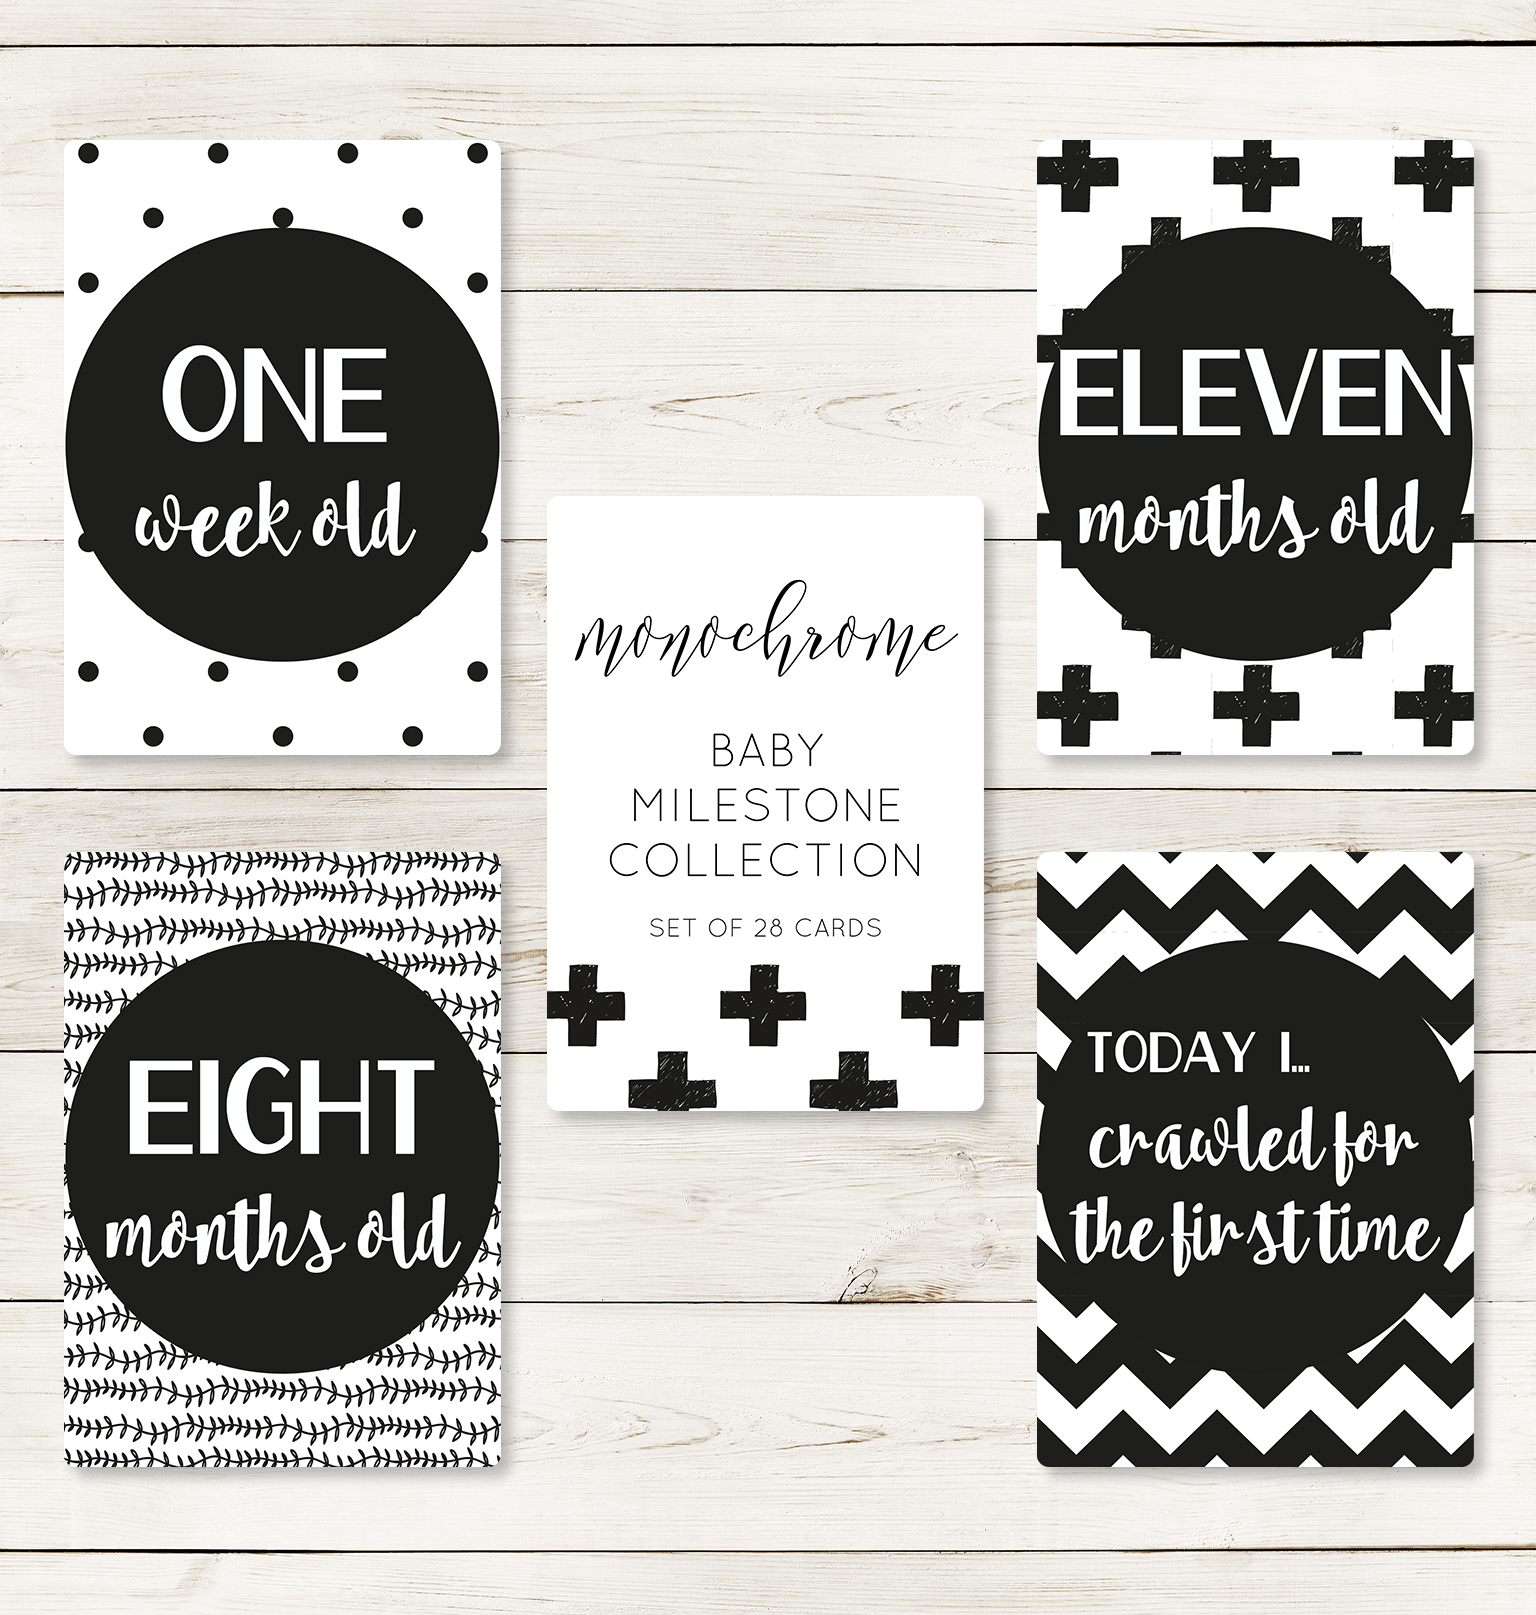 Monochrome Milestone Cards